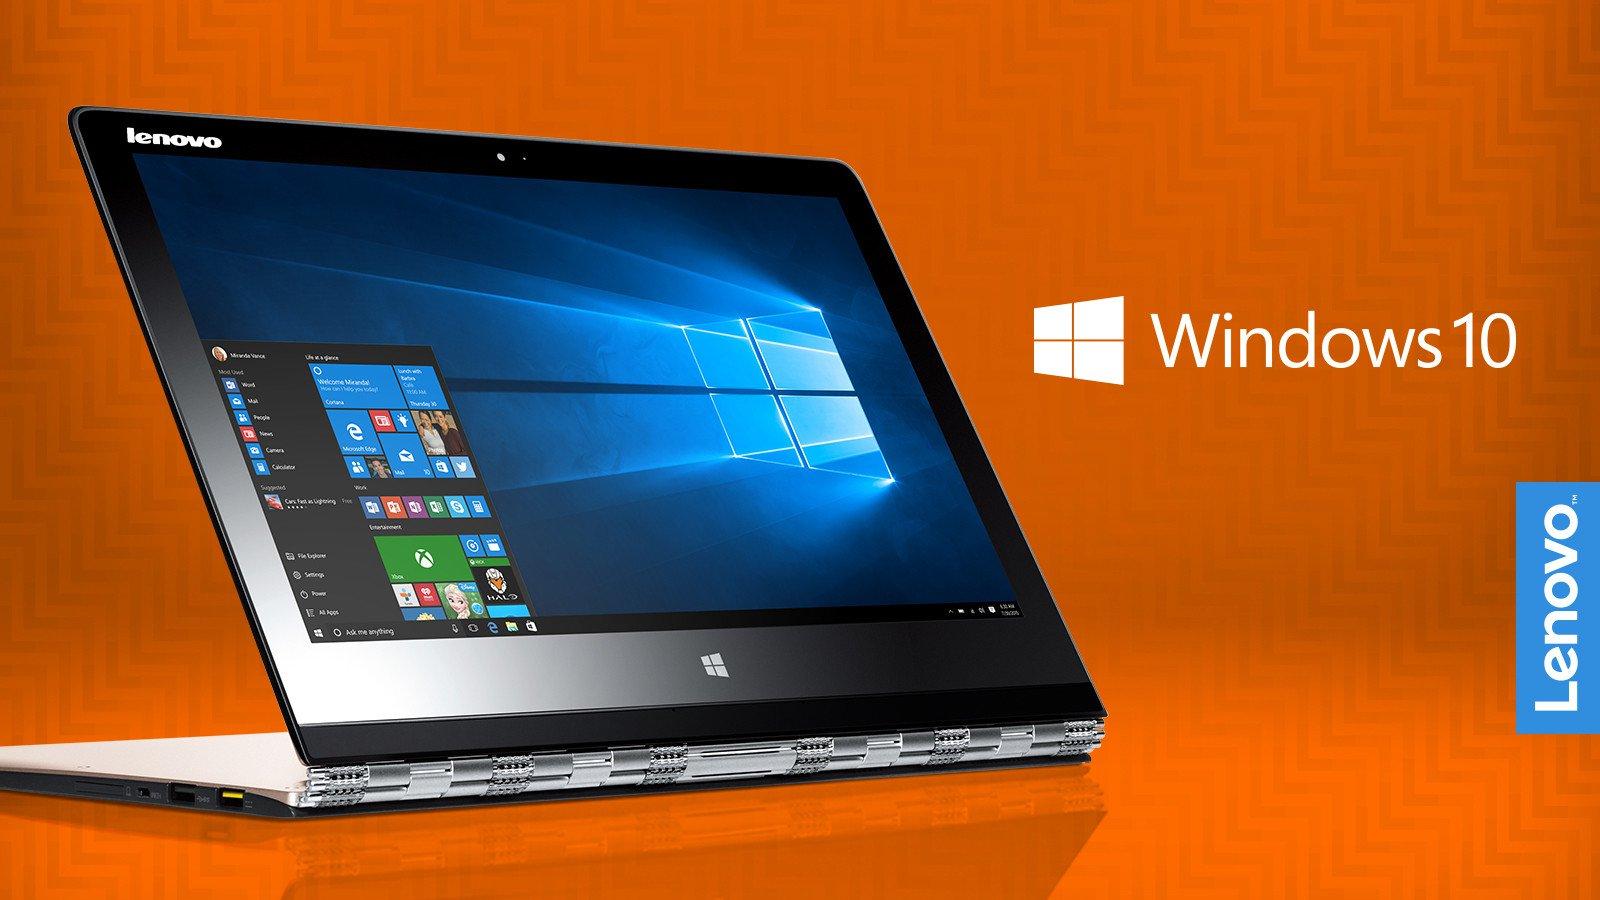 Lenovo Windows 10 Upgrade